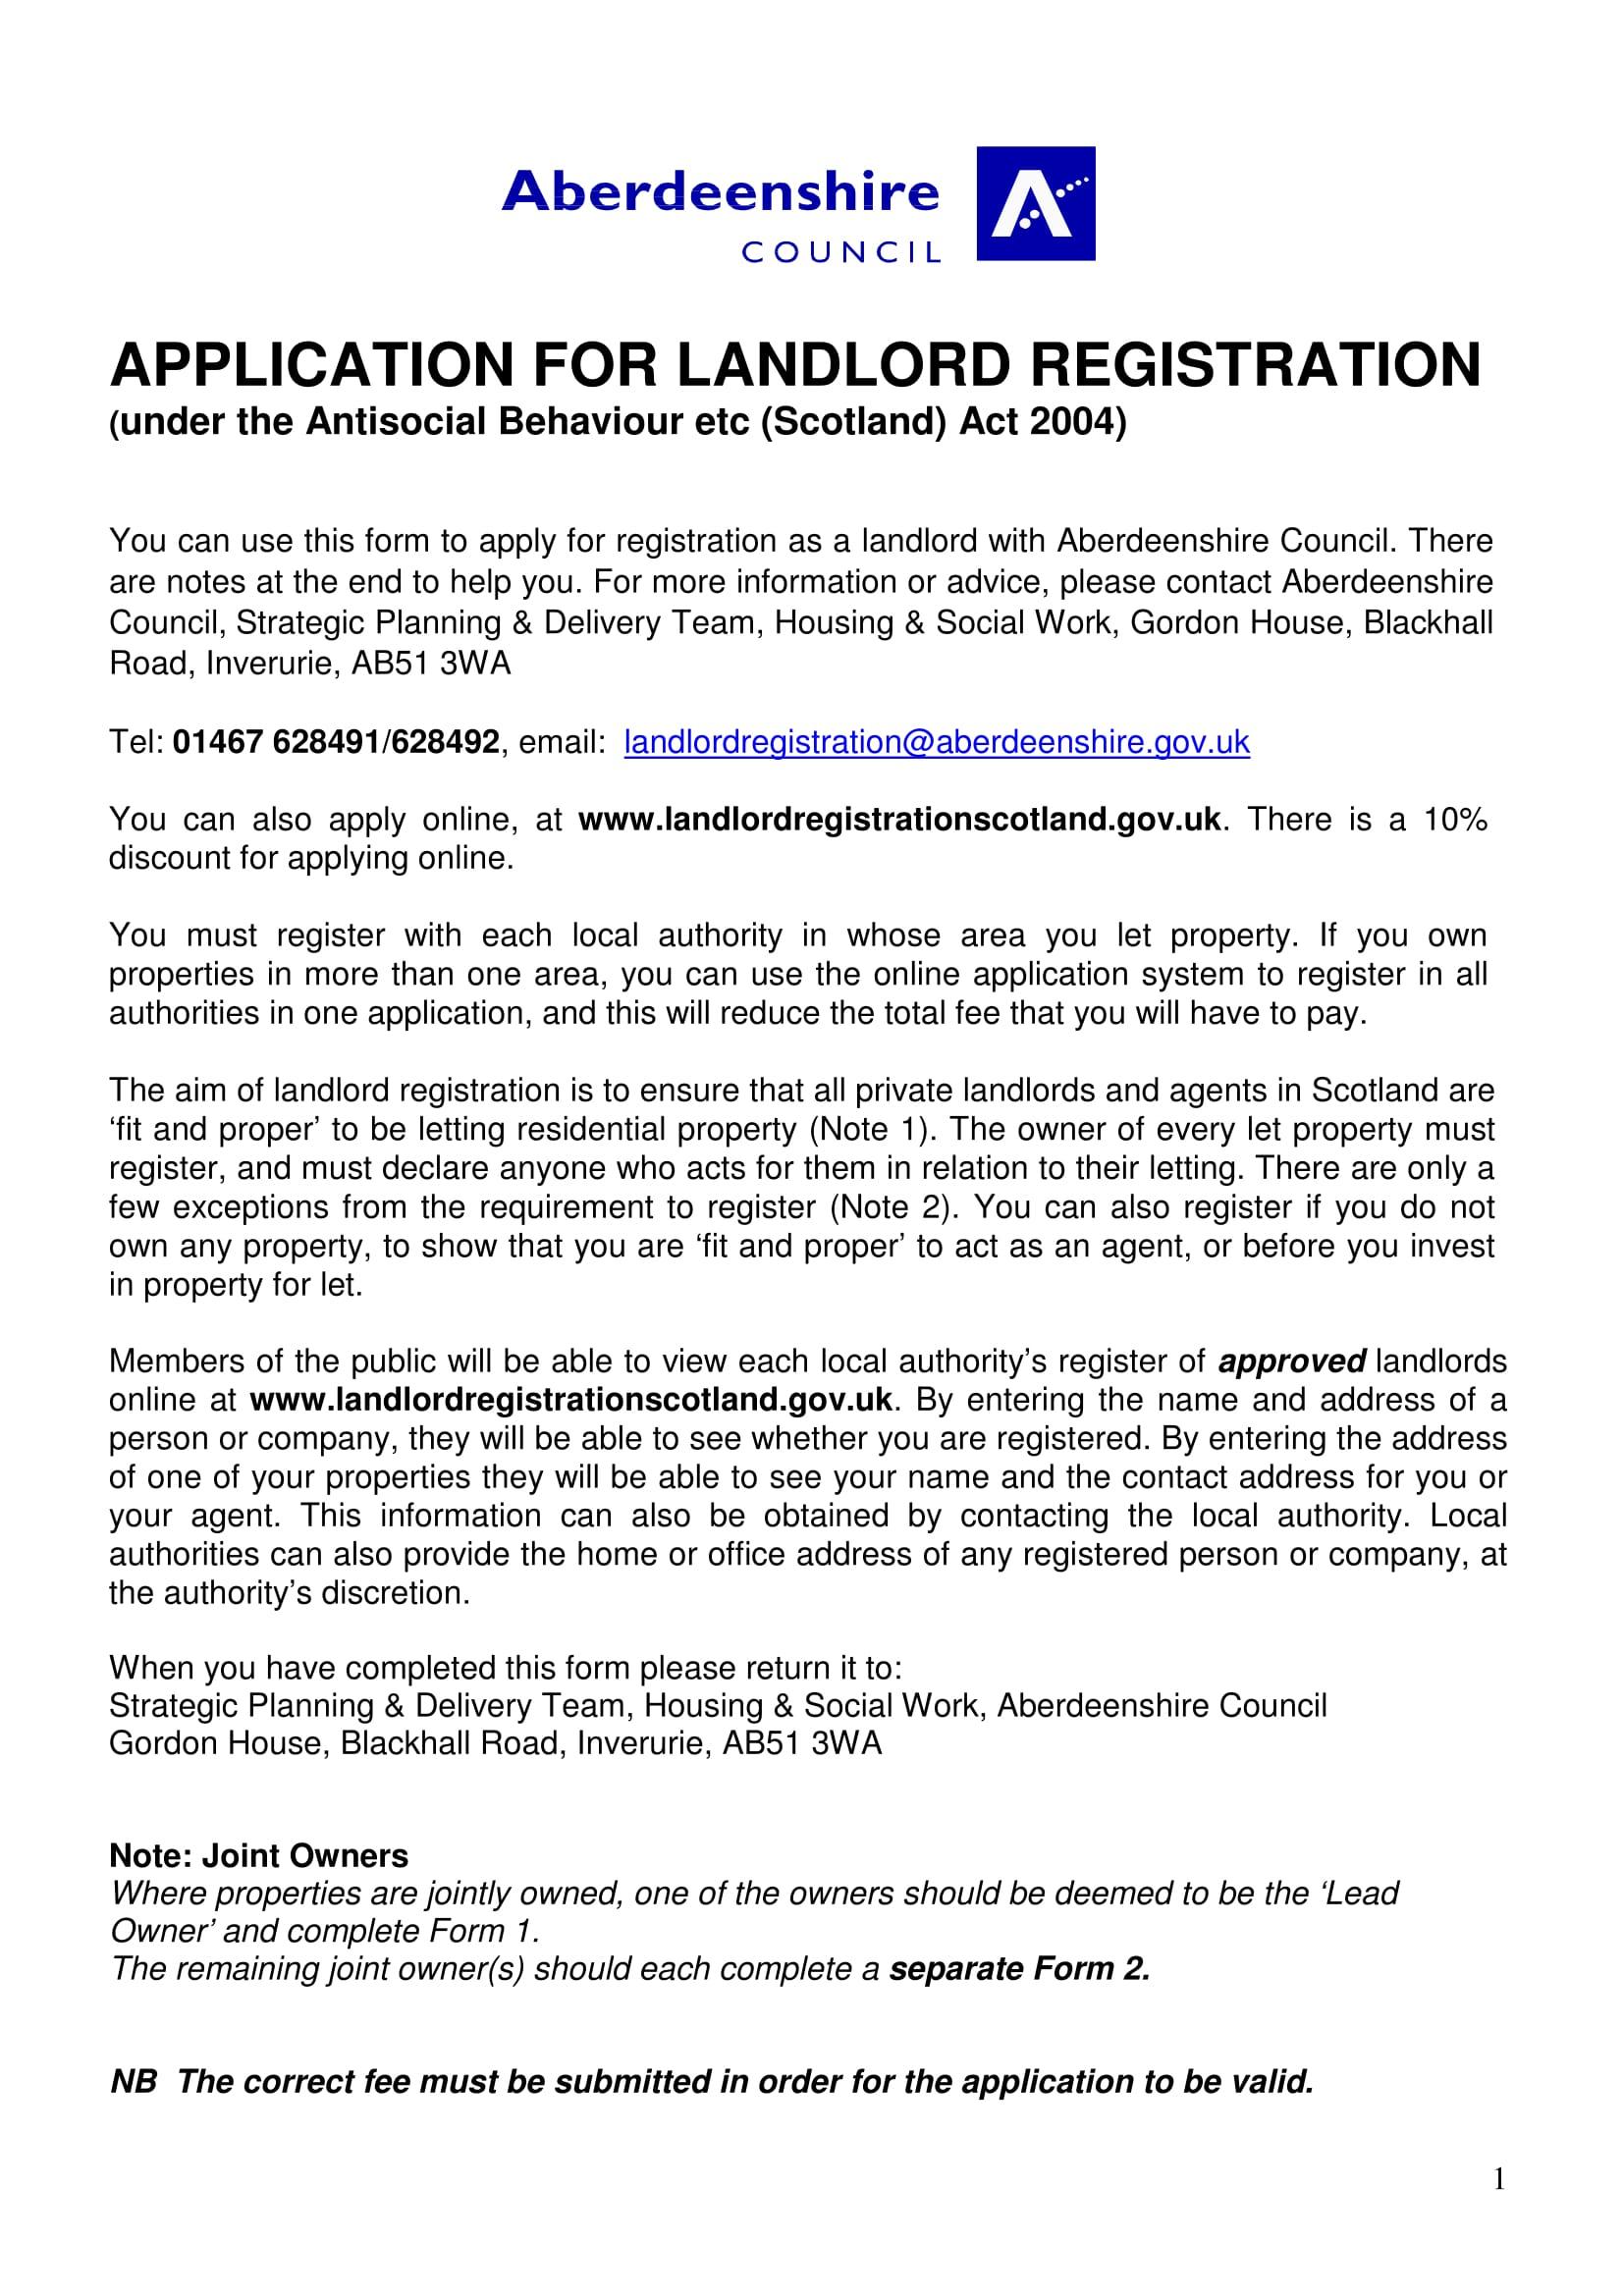 landlordregistrationleadownerapplication 01